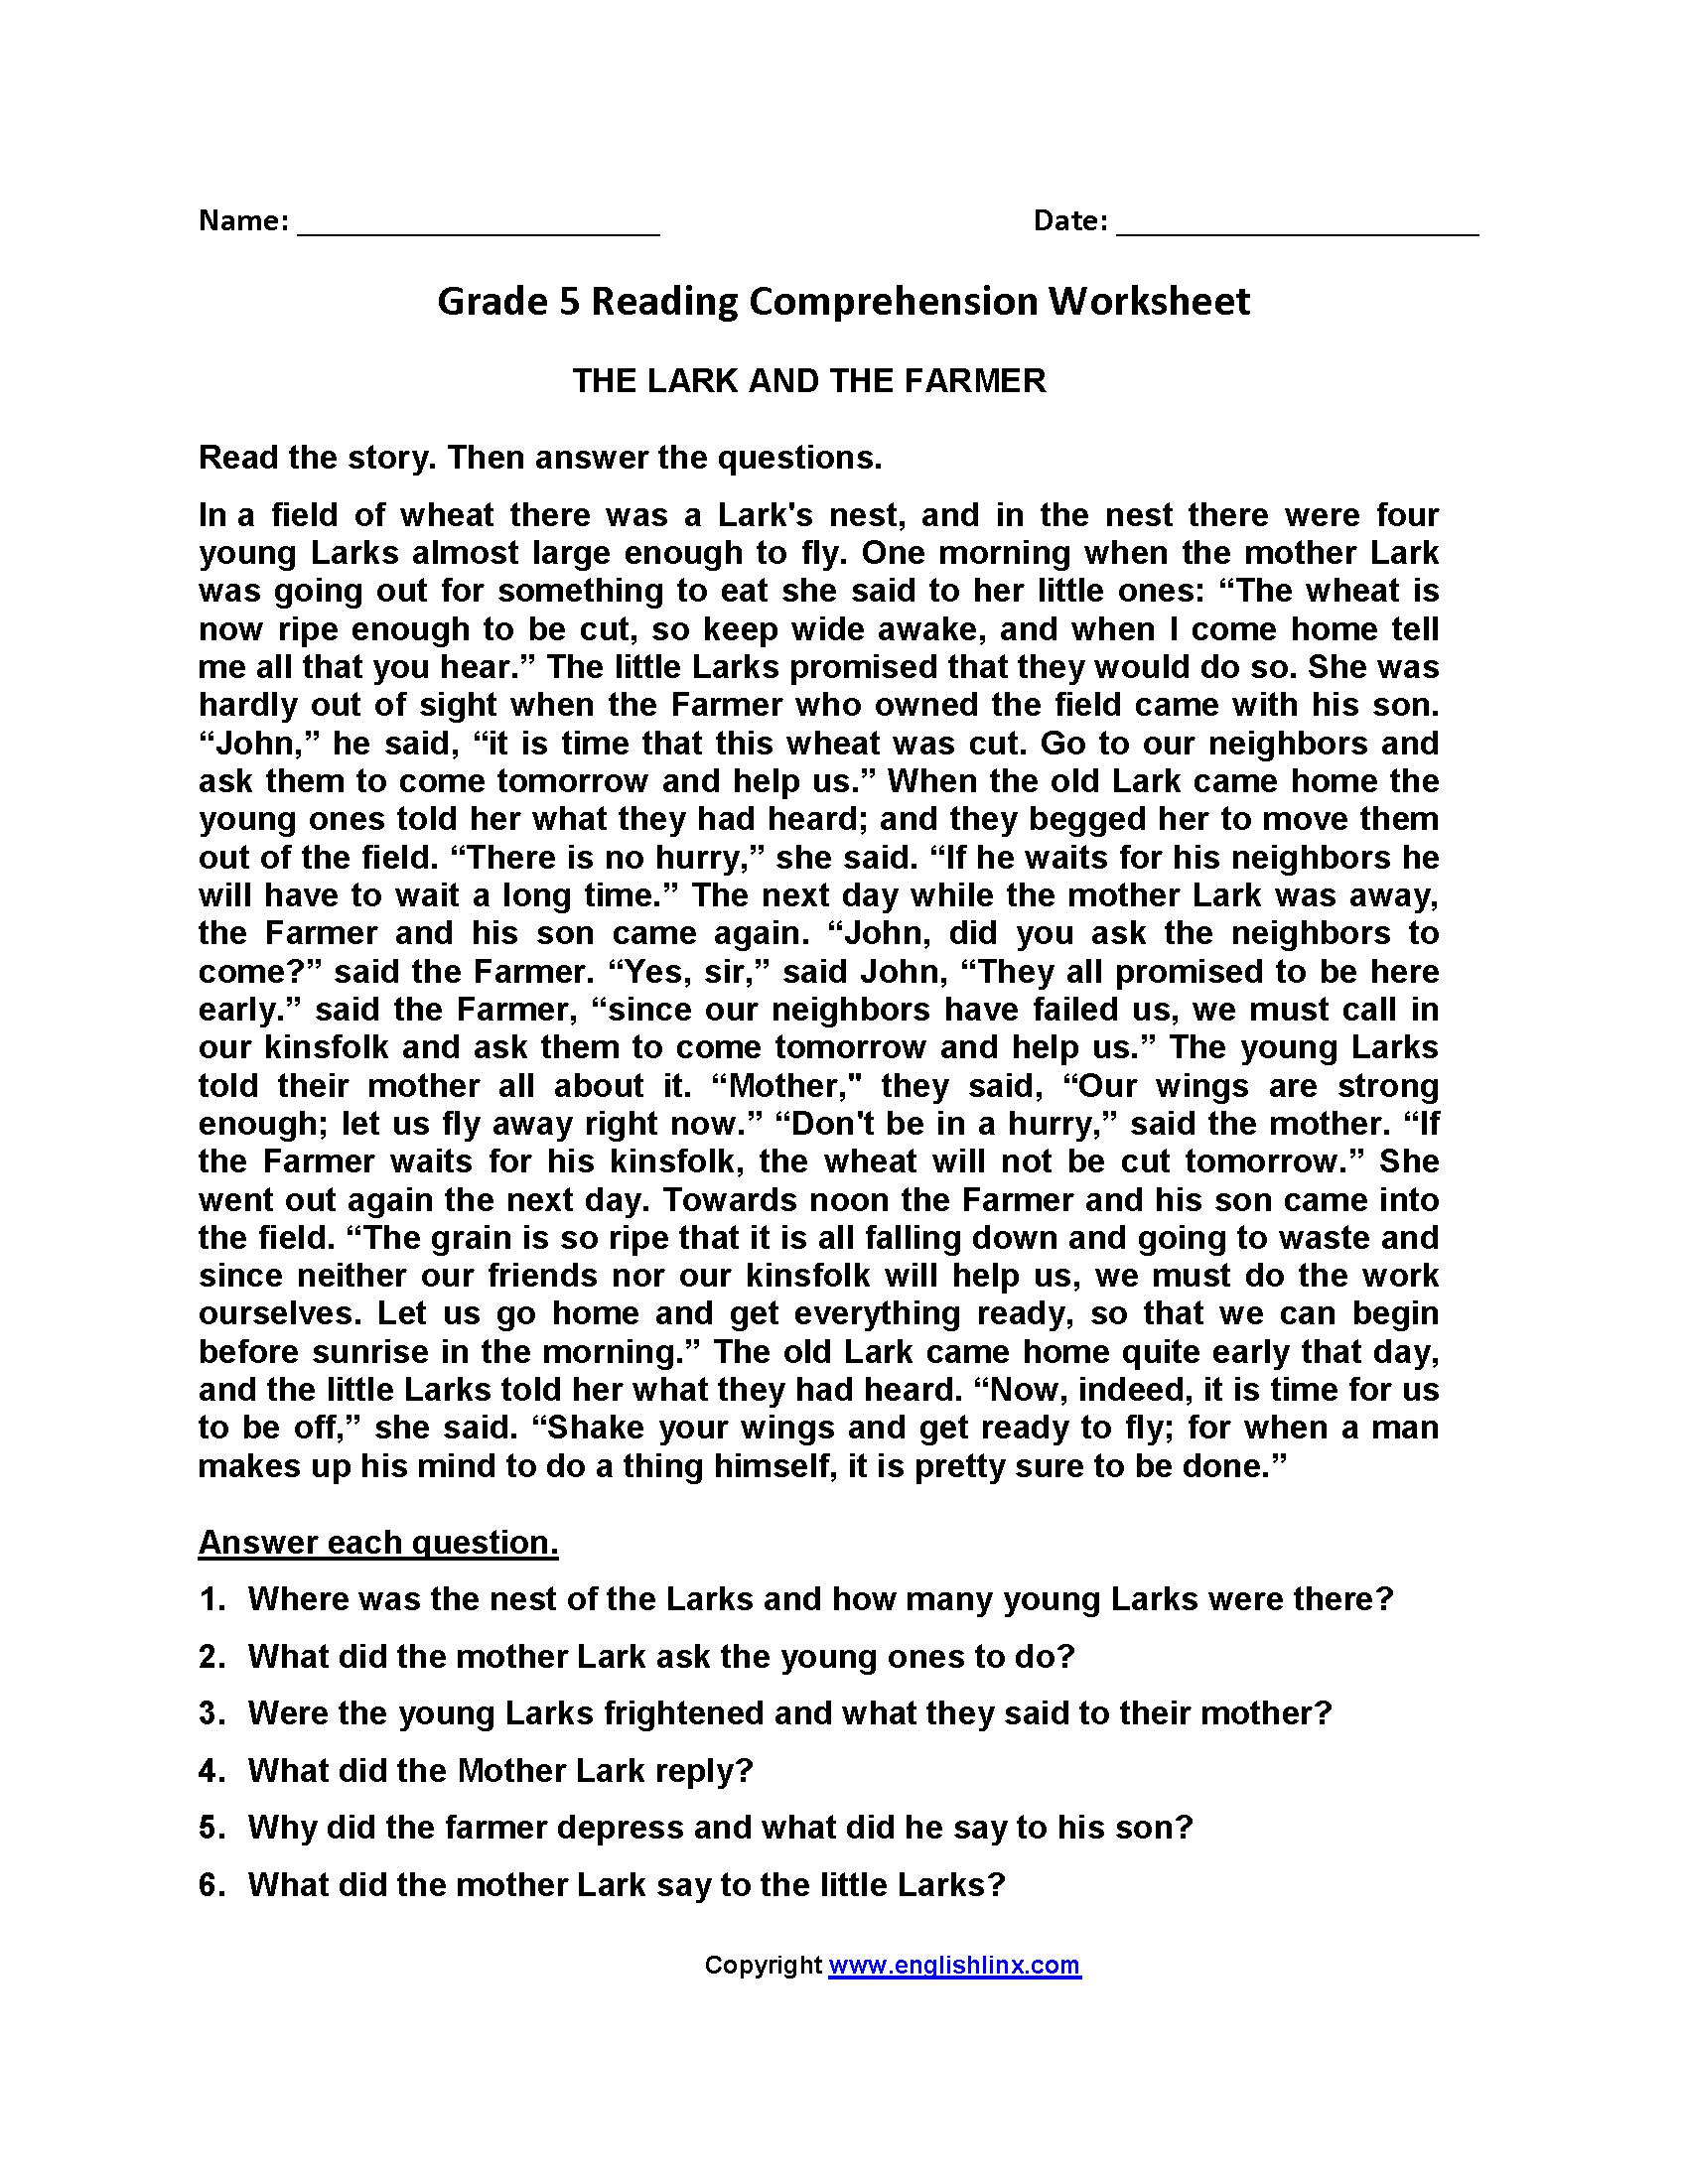 Lark and Farmer Fifth Grade Reading Worksheets   Reading comprehension  worksheets [ 2200 x 1700 Pixel ]